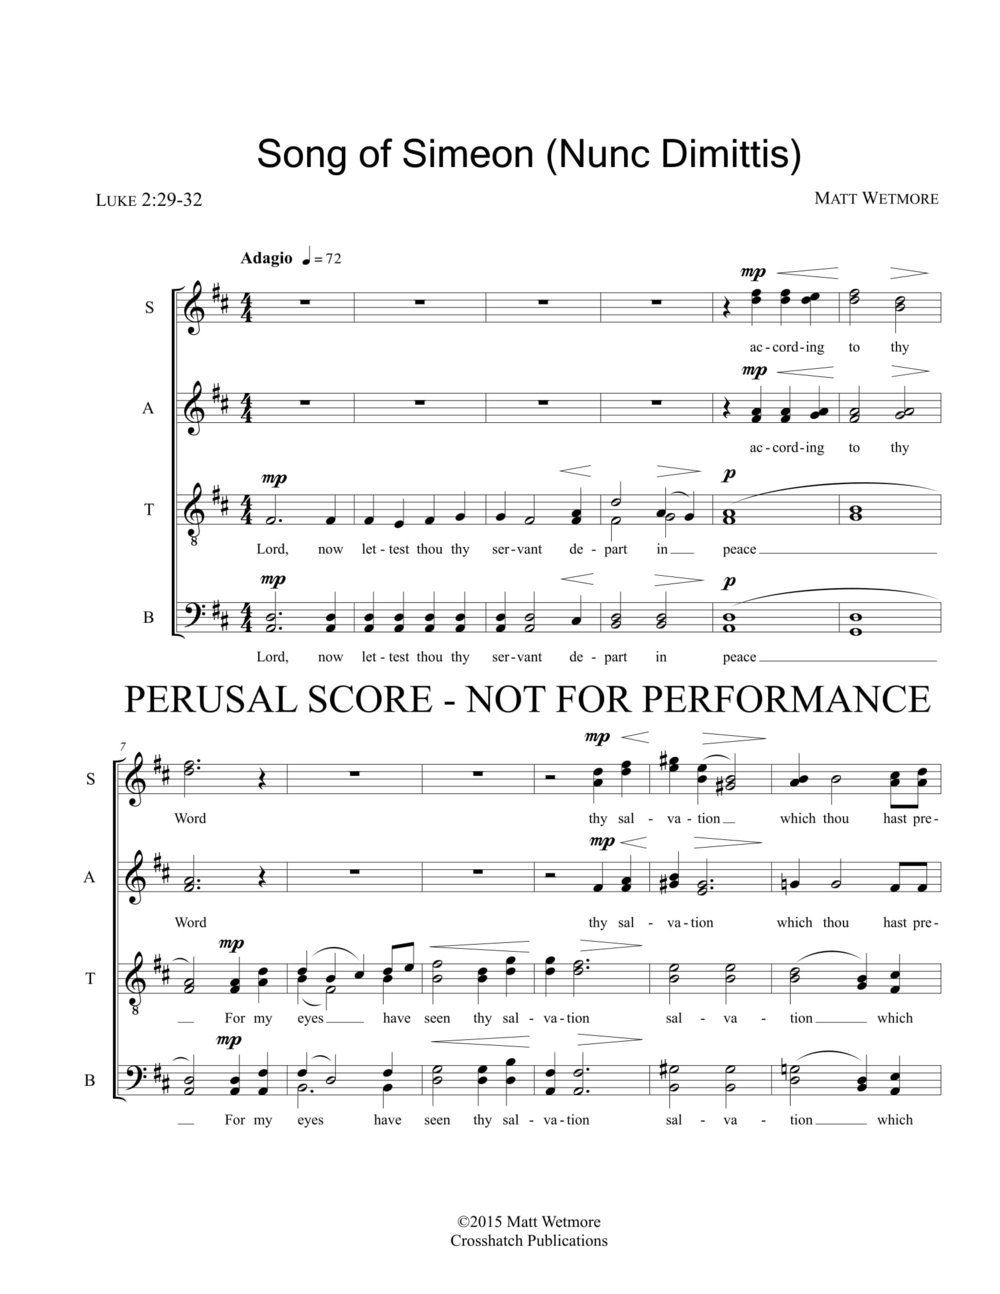 Song of Simeon - Perusal-3.jpg